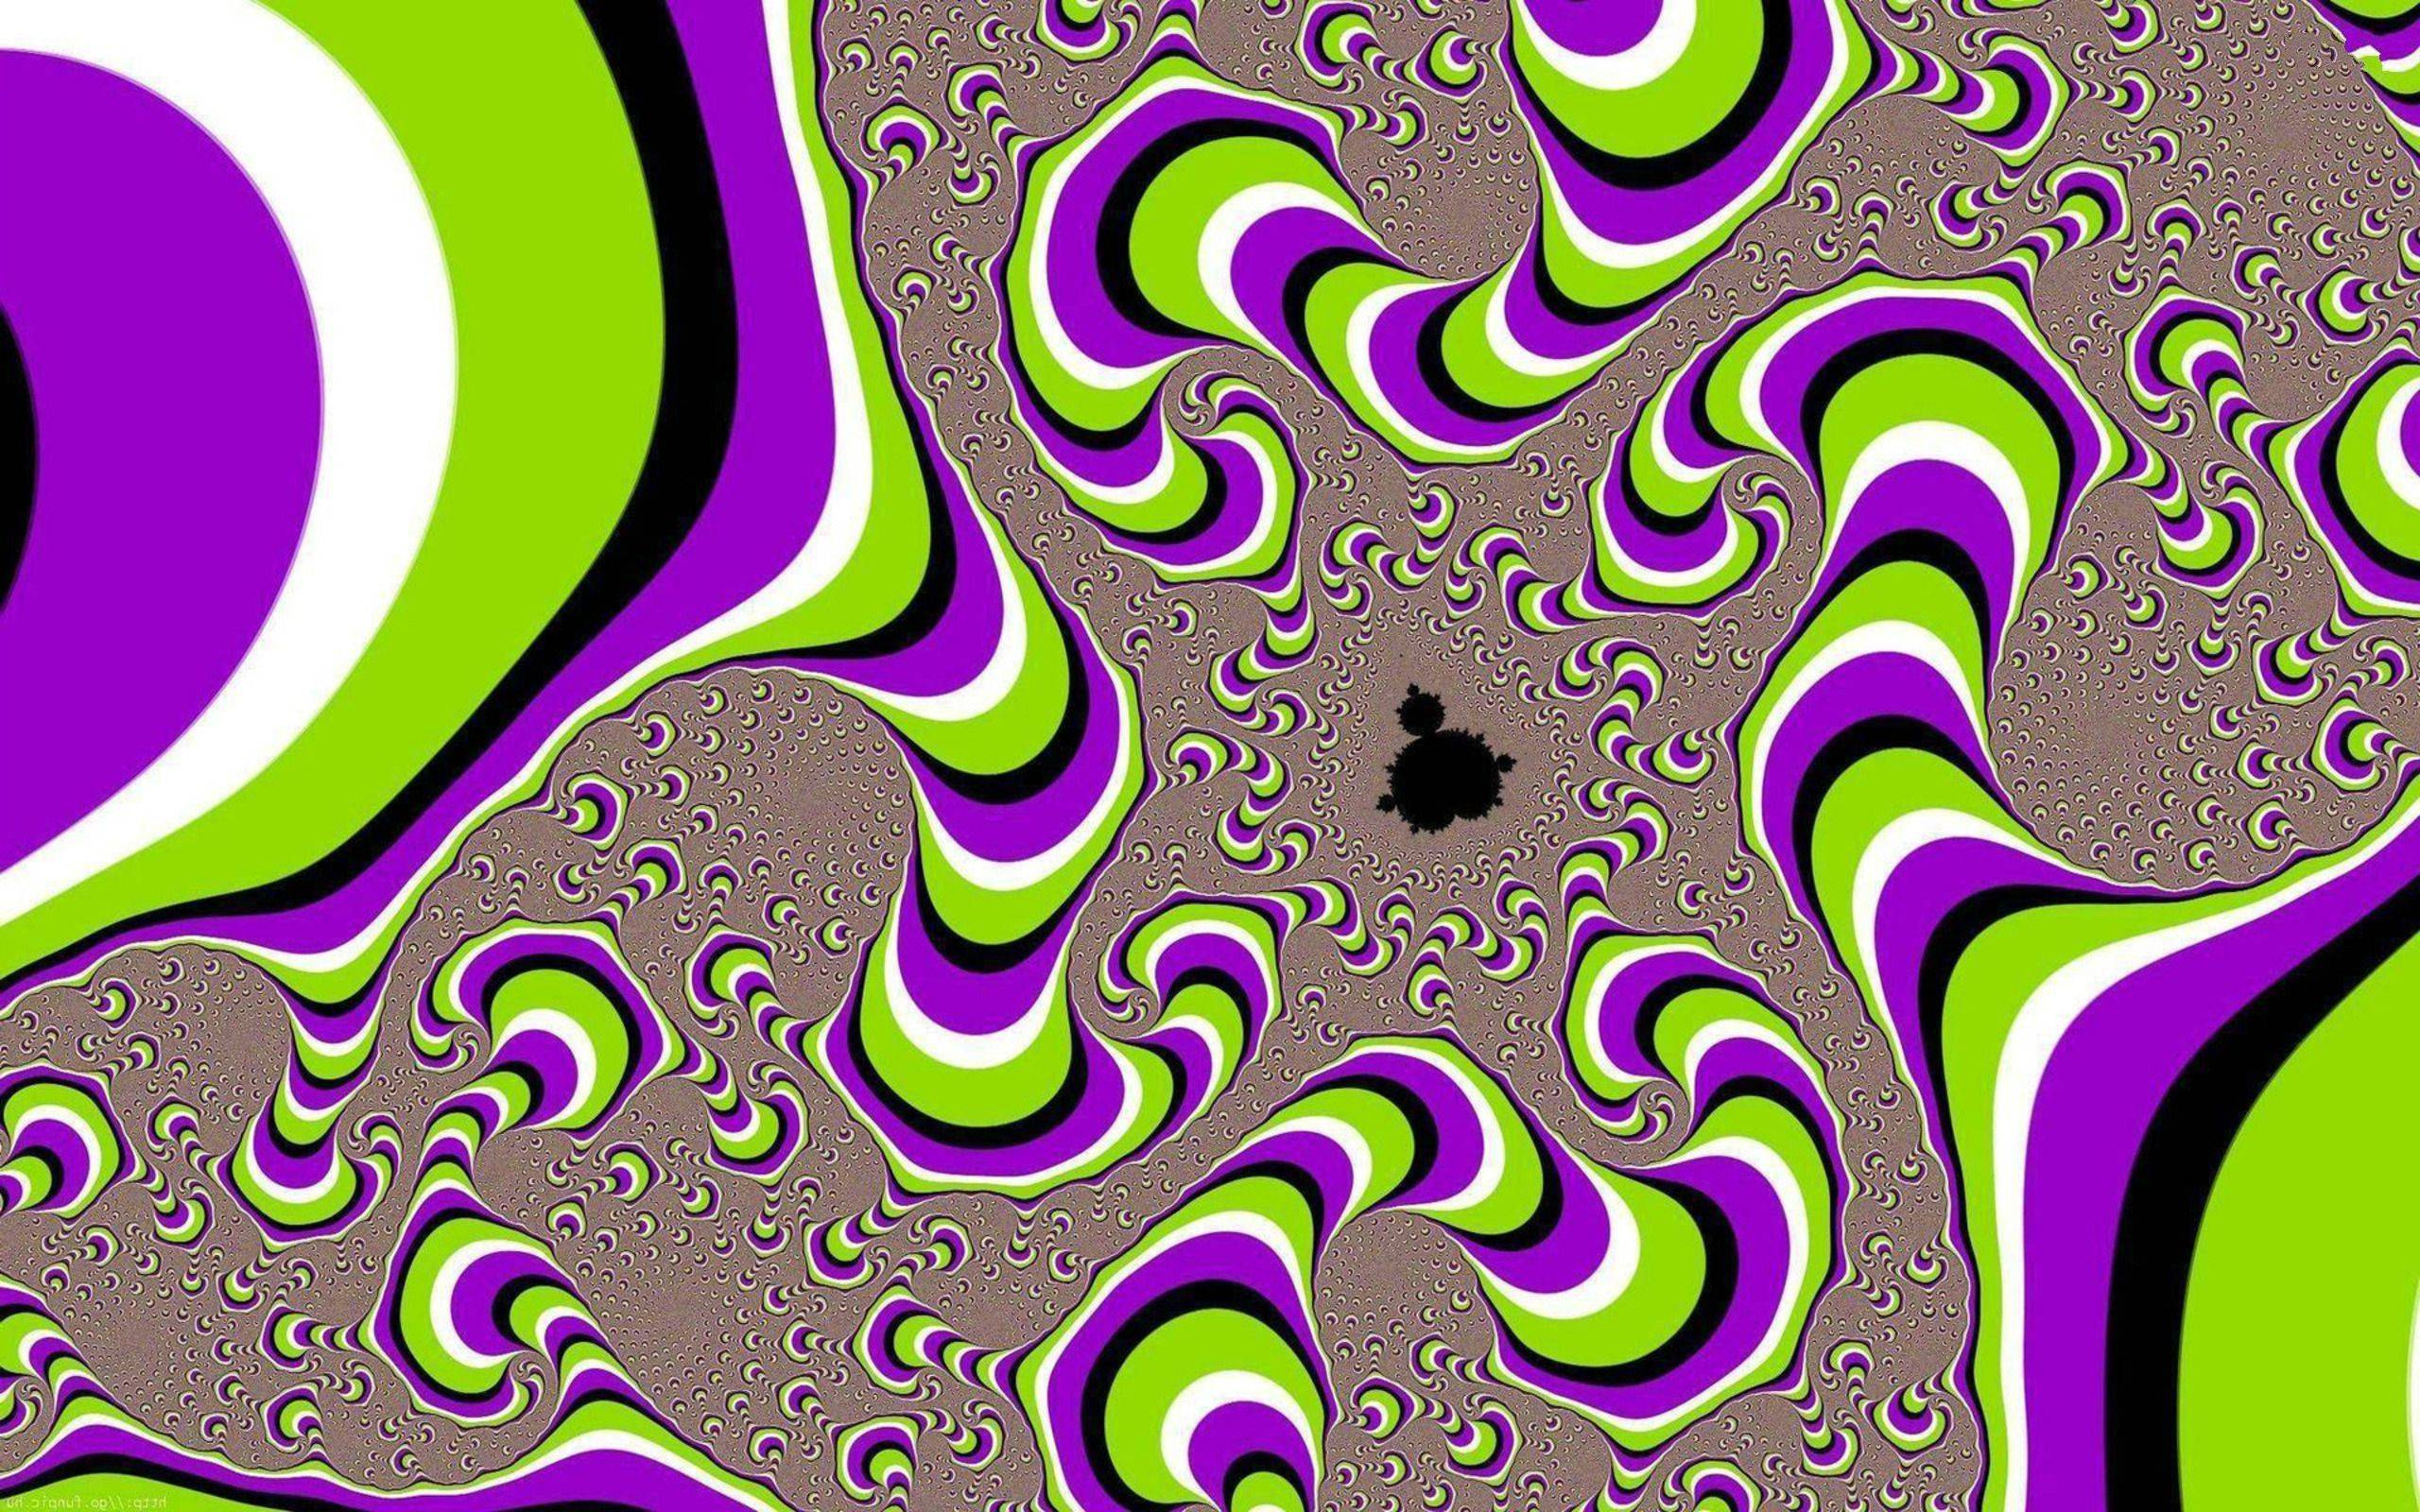 hypnosis moving wallpaper hypnotic - photo #35